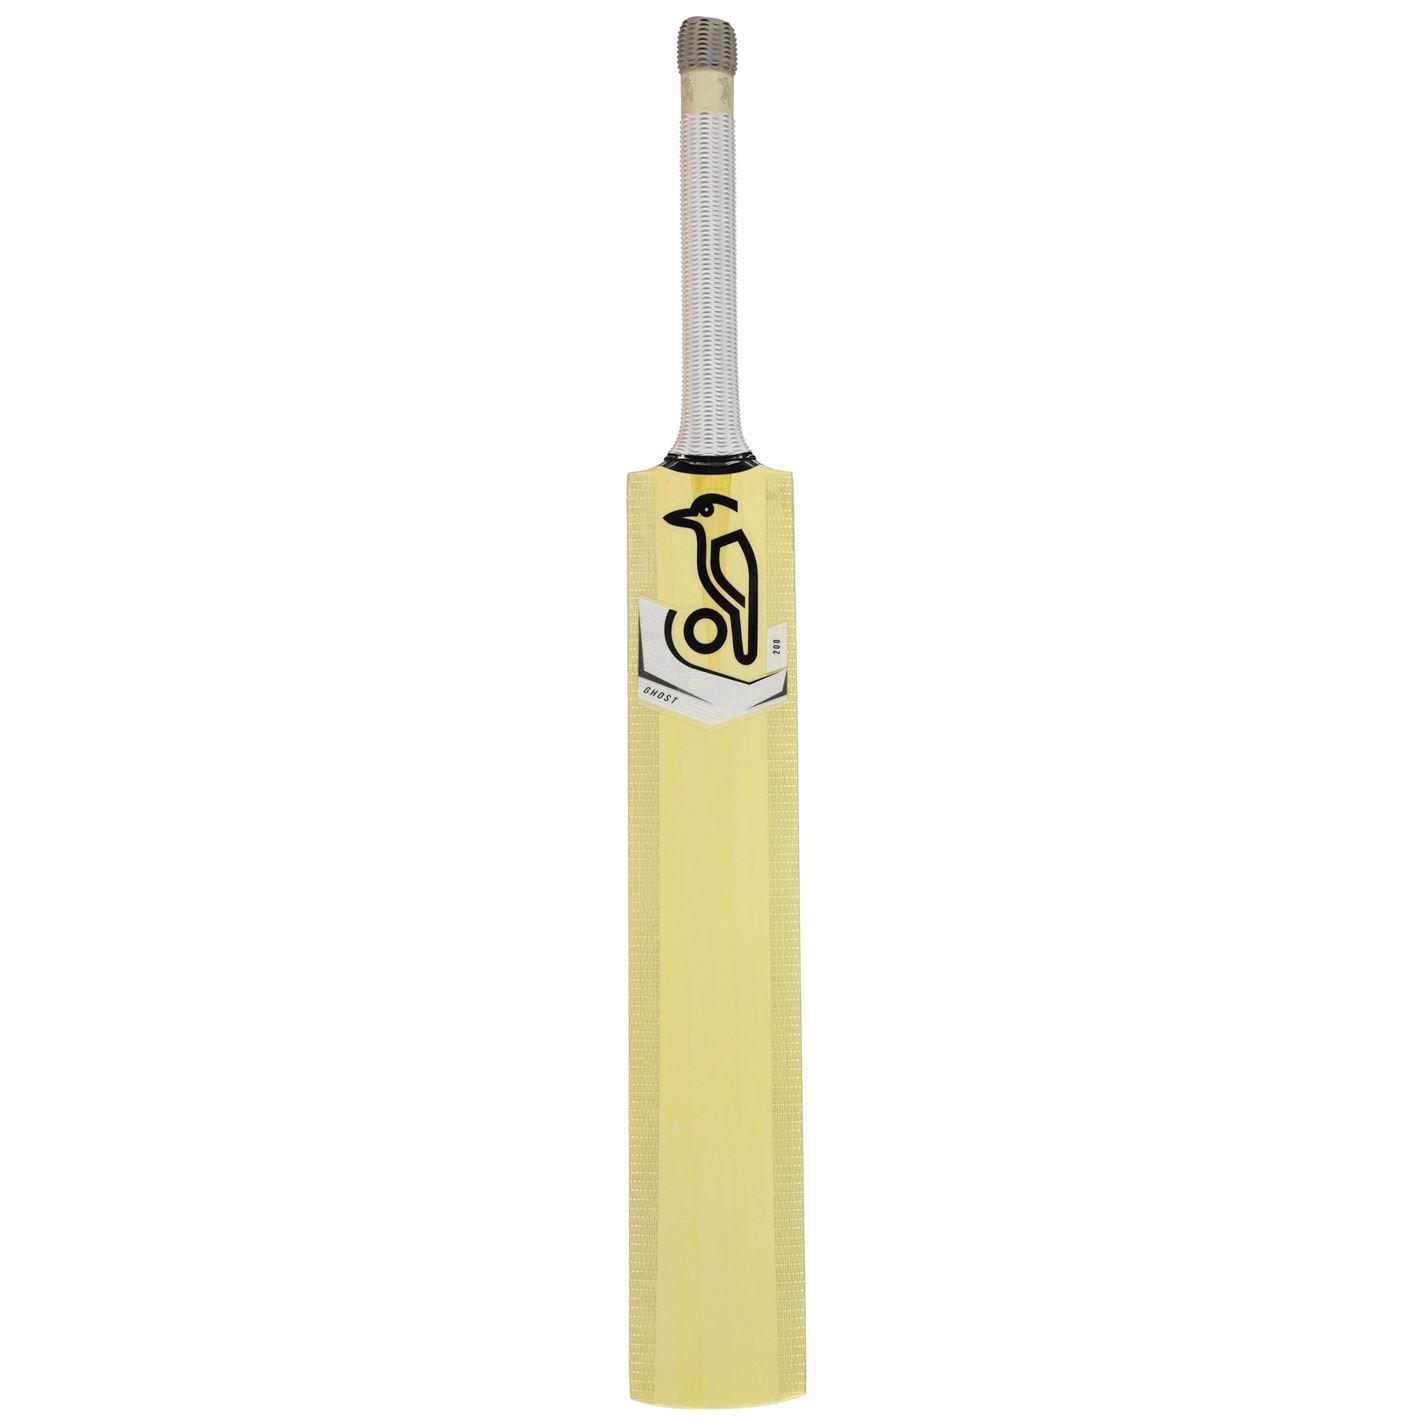 Kookaburra Ghost 200 Cricket Bat Junior